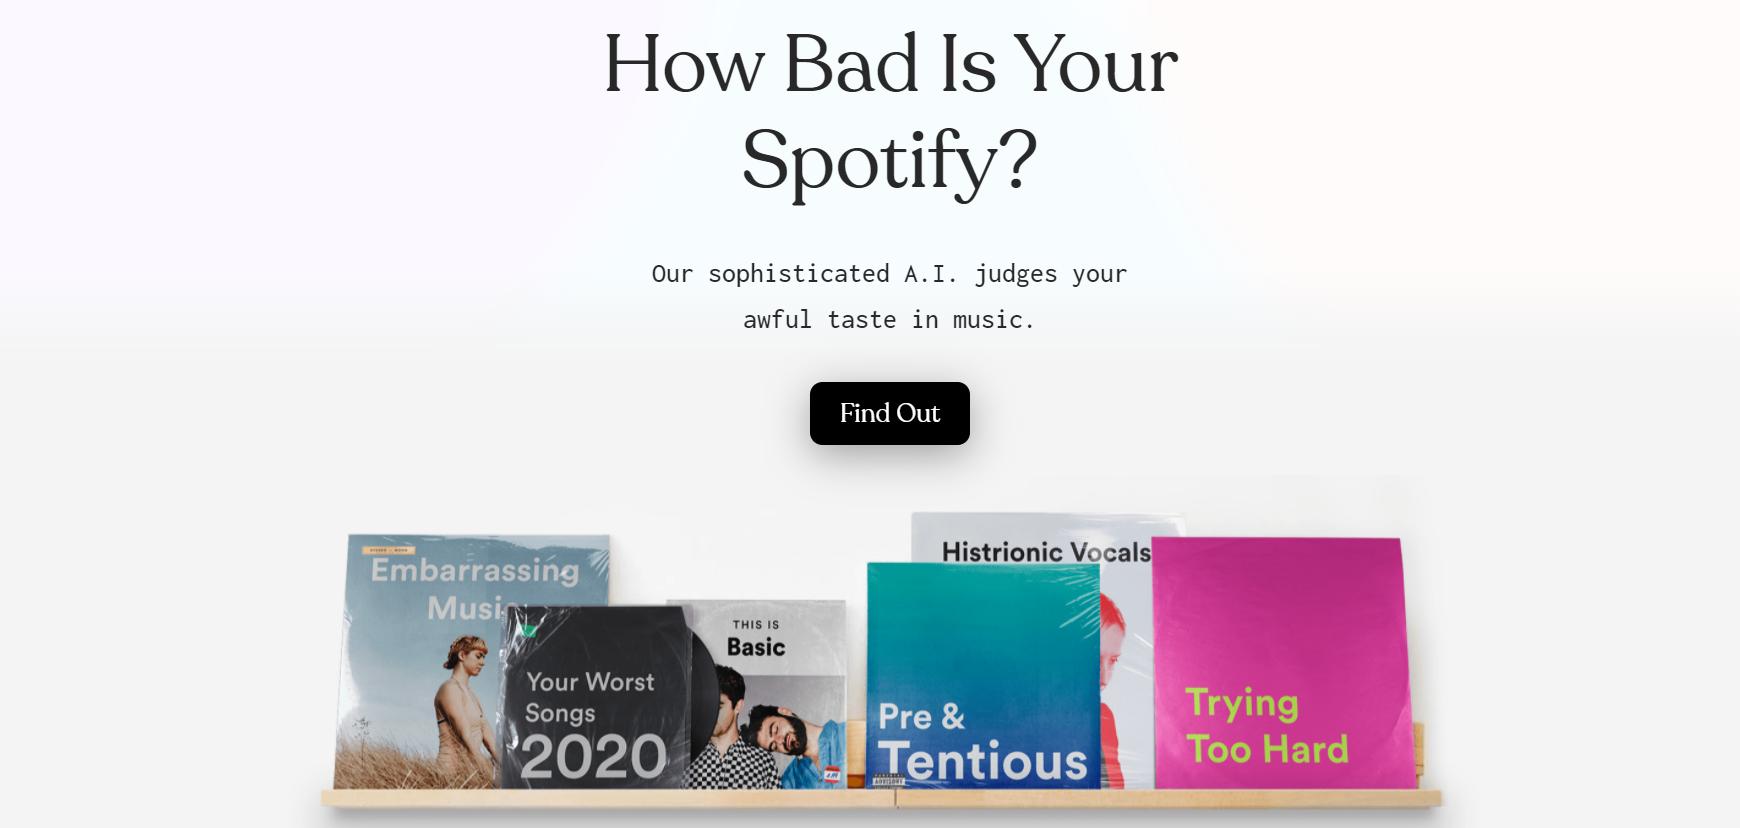 spotify bad listening